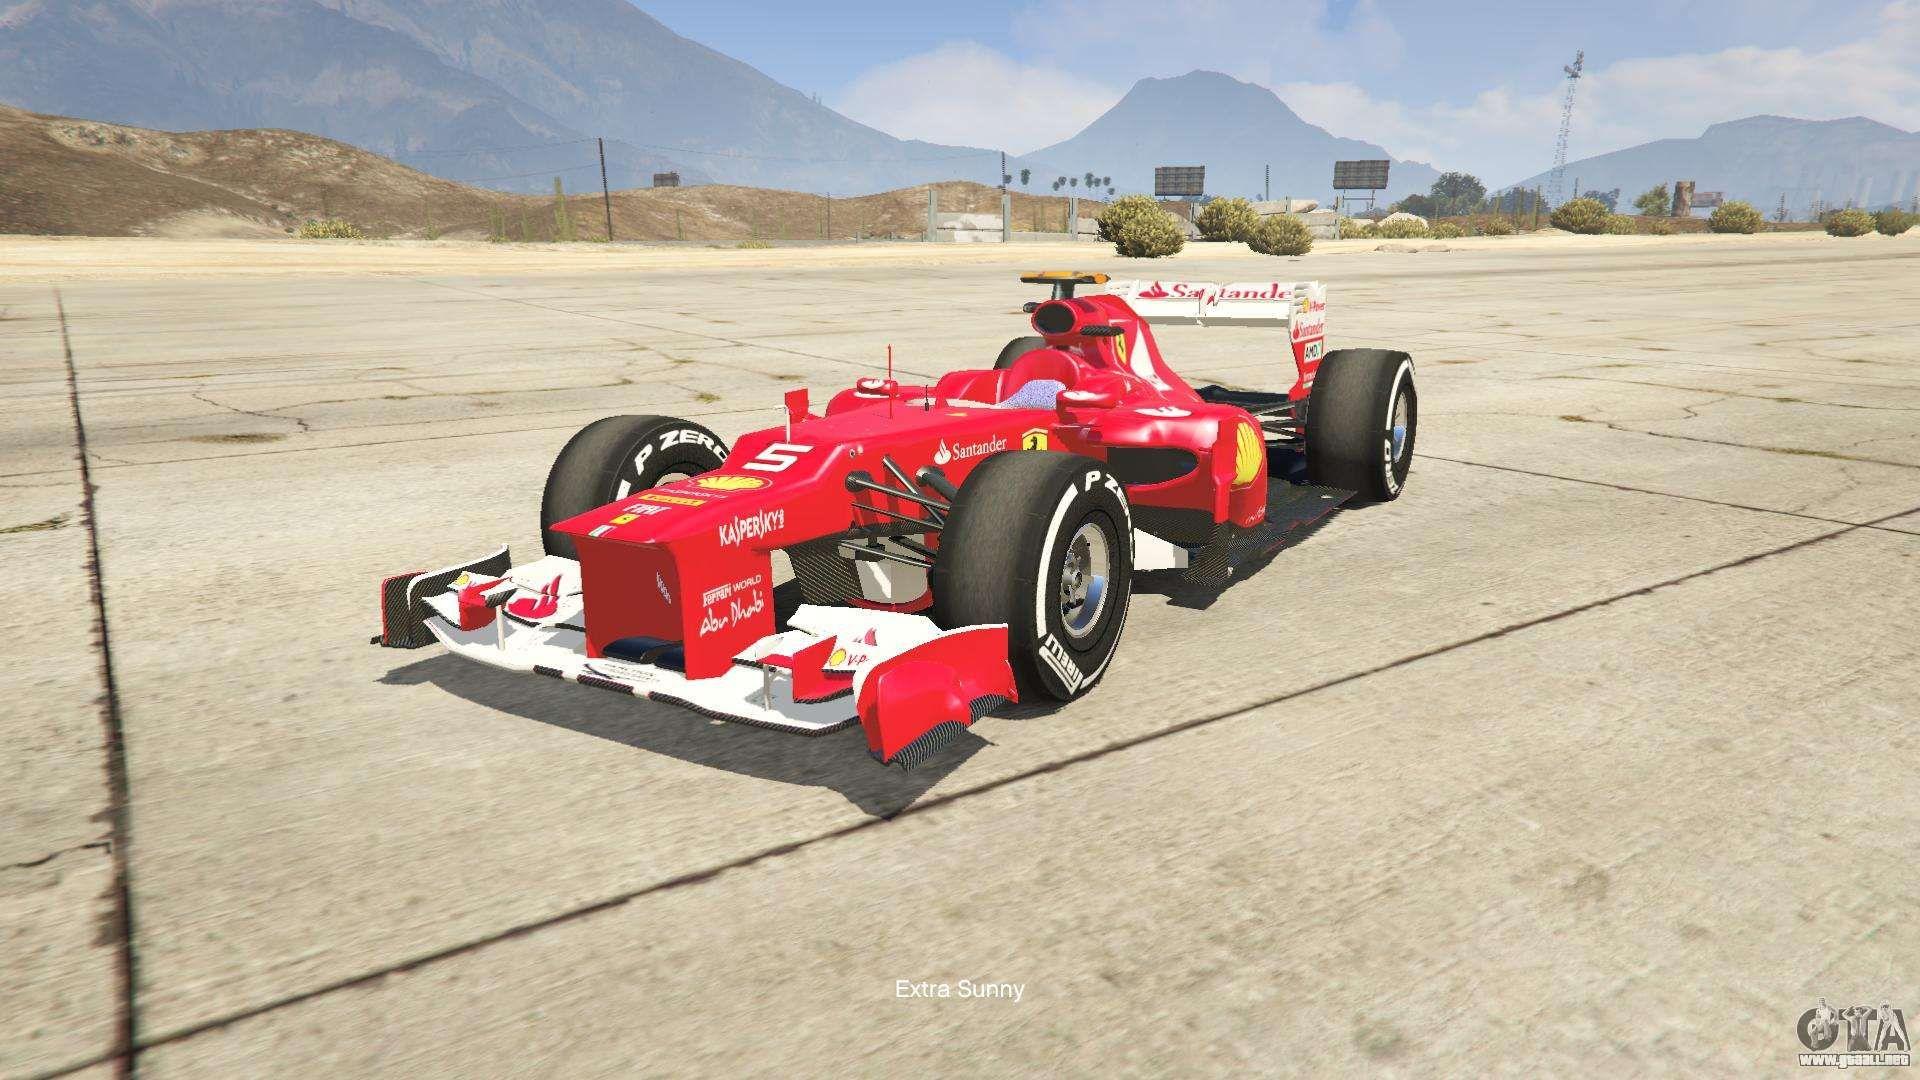 13fe1e9235ddcb587eed403844868799 - How To Get A Formula 1 Car In Gta 5